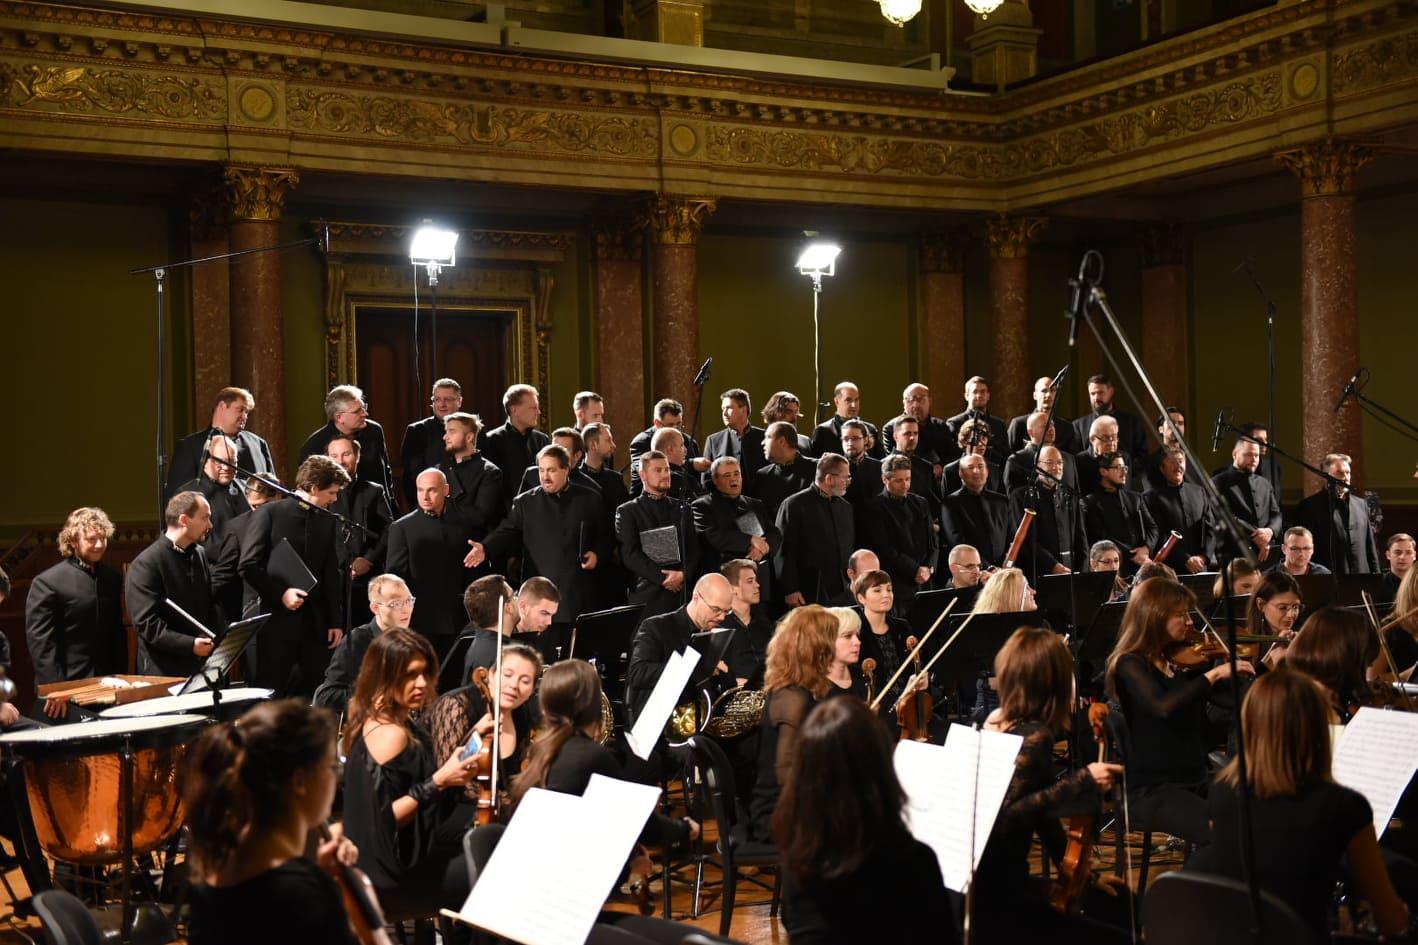 Cherubini ritkán hallható d-moll Requiemje